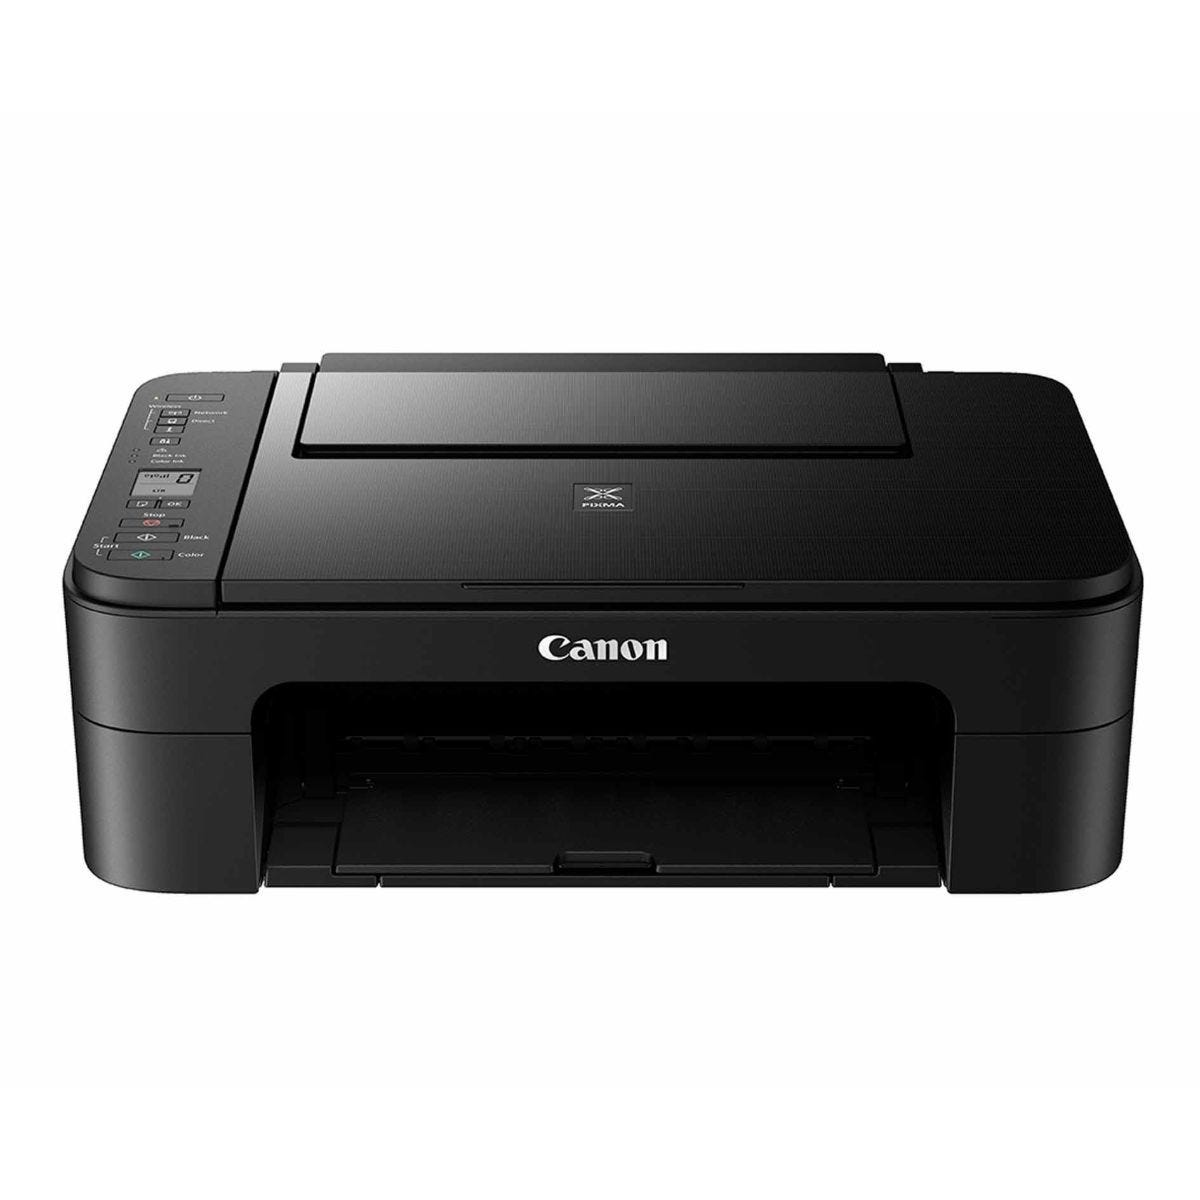 Canon Pixma TS3150 All in One Wireless Inkjet Printer